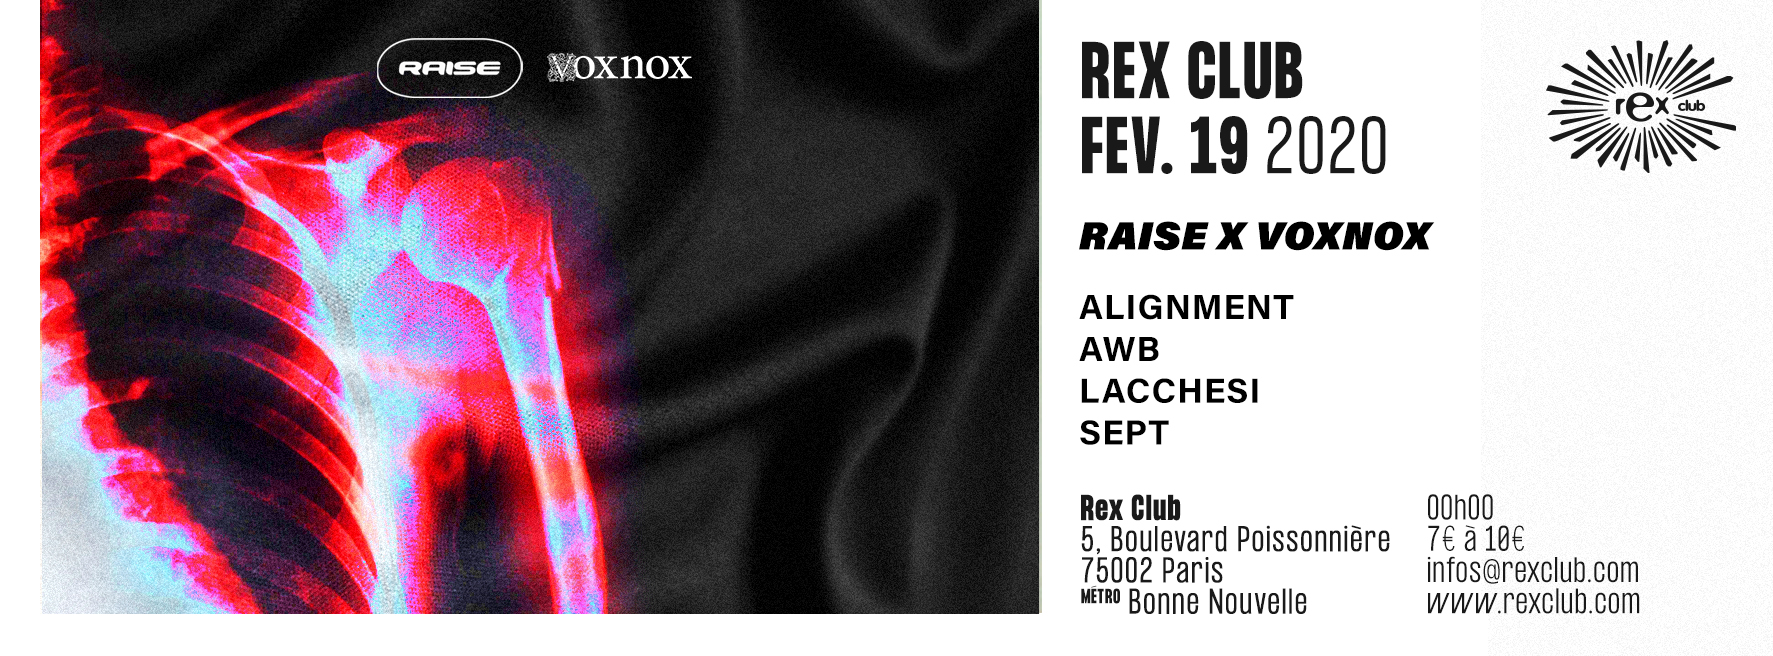 Raise x Voxnox: Alignment, AWB, Lacchesi, Sept